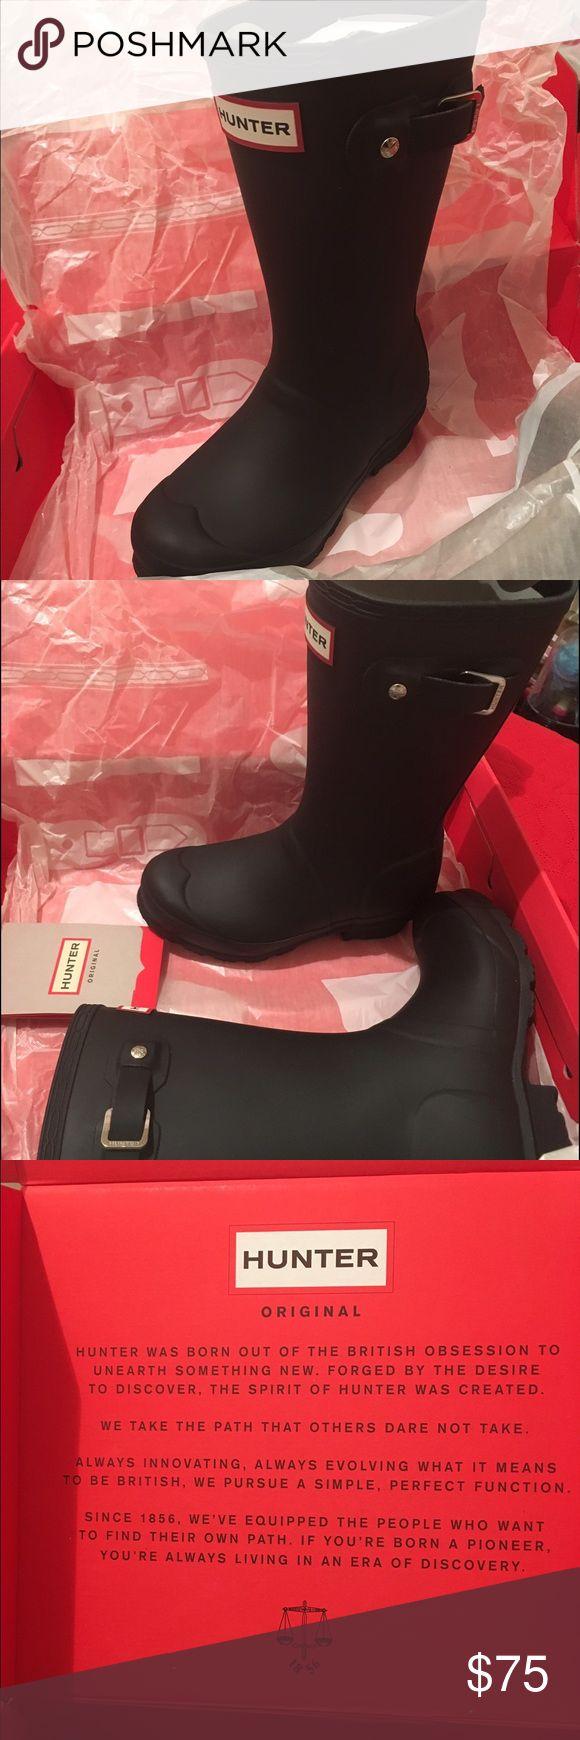 Little kids hunter rain boots, size 13. Black hunter rain boots, size 13. Hunter Boots Shoes Rain & Snow Boots